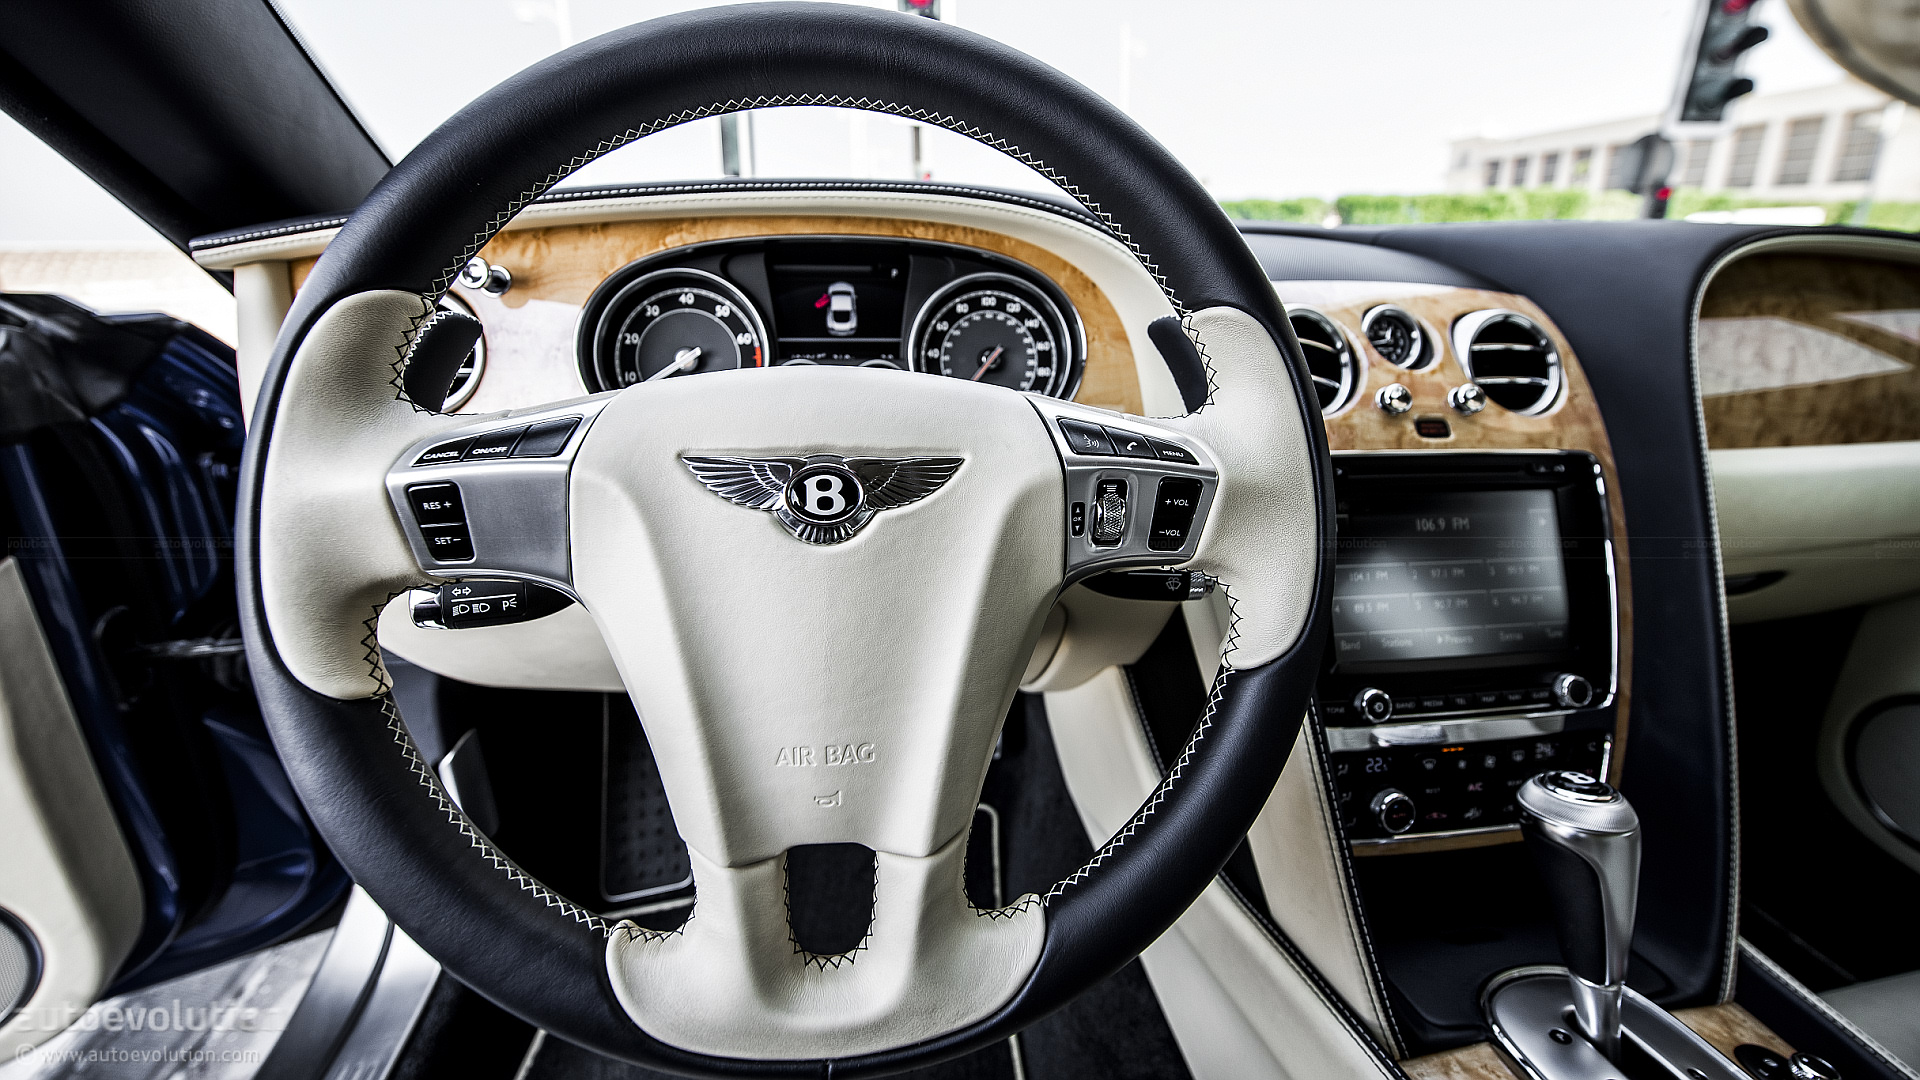 Vw Car Net Review >> BENTLEY Continental GT W12 Review - autoevolution